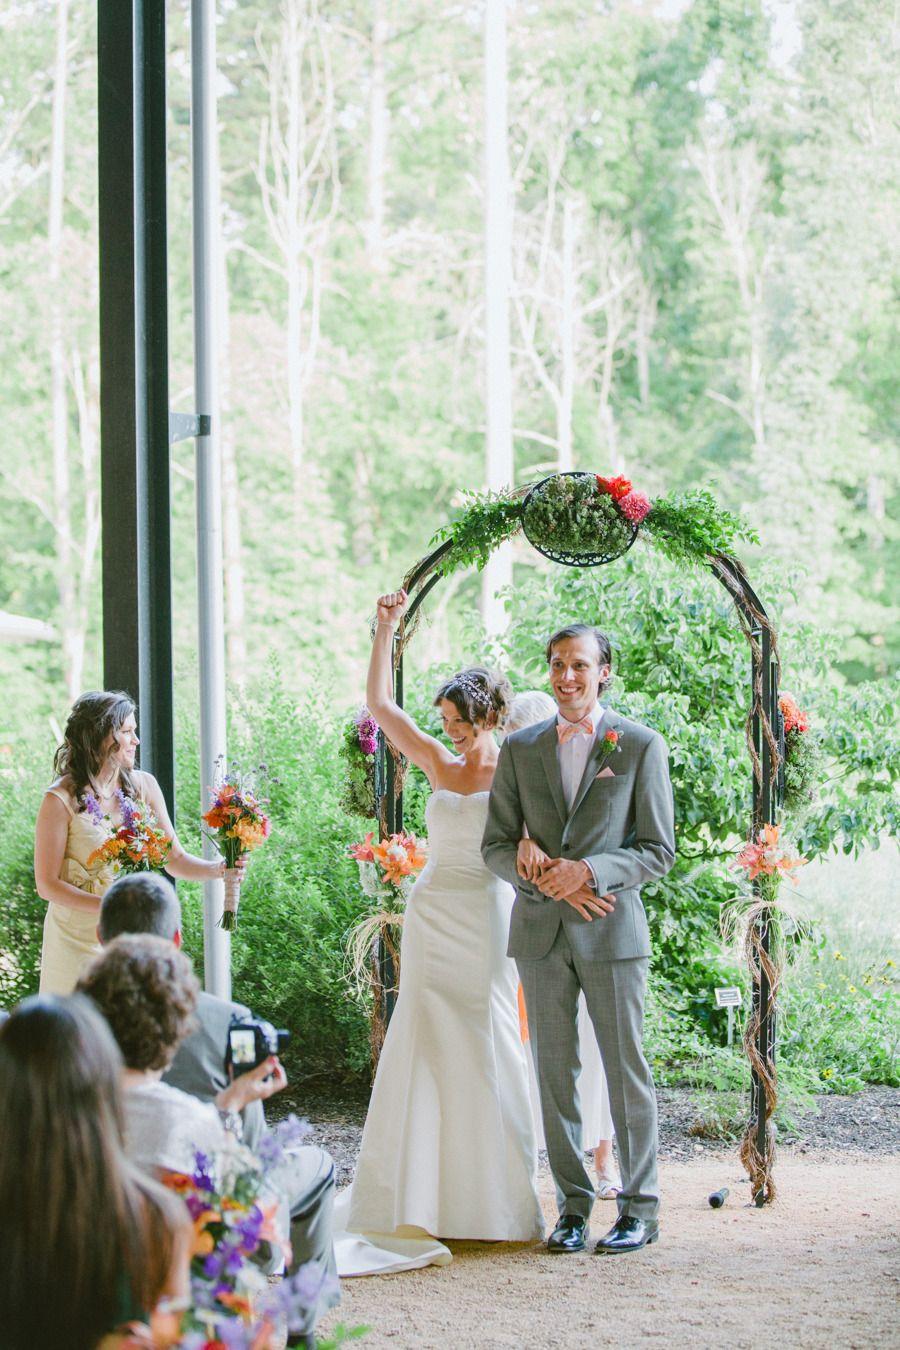 Whimsical Botanical Garden Wedding Botanical gardens